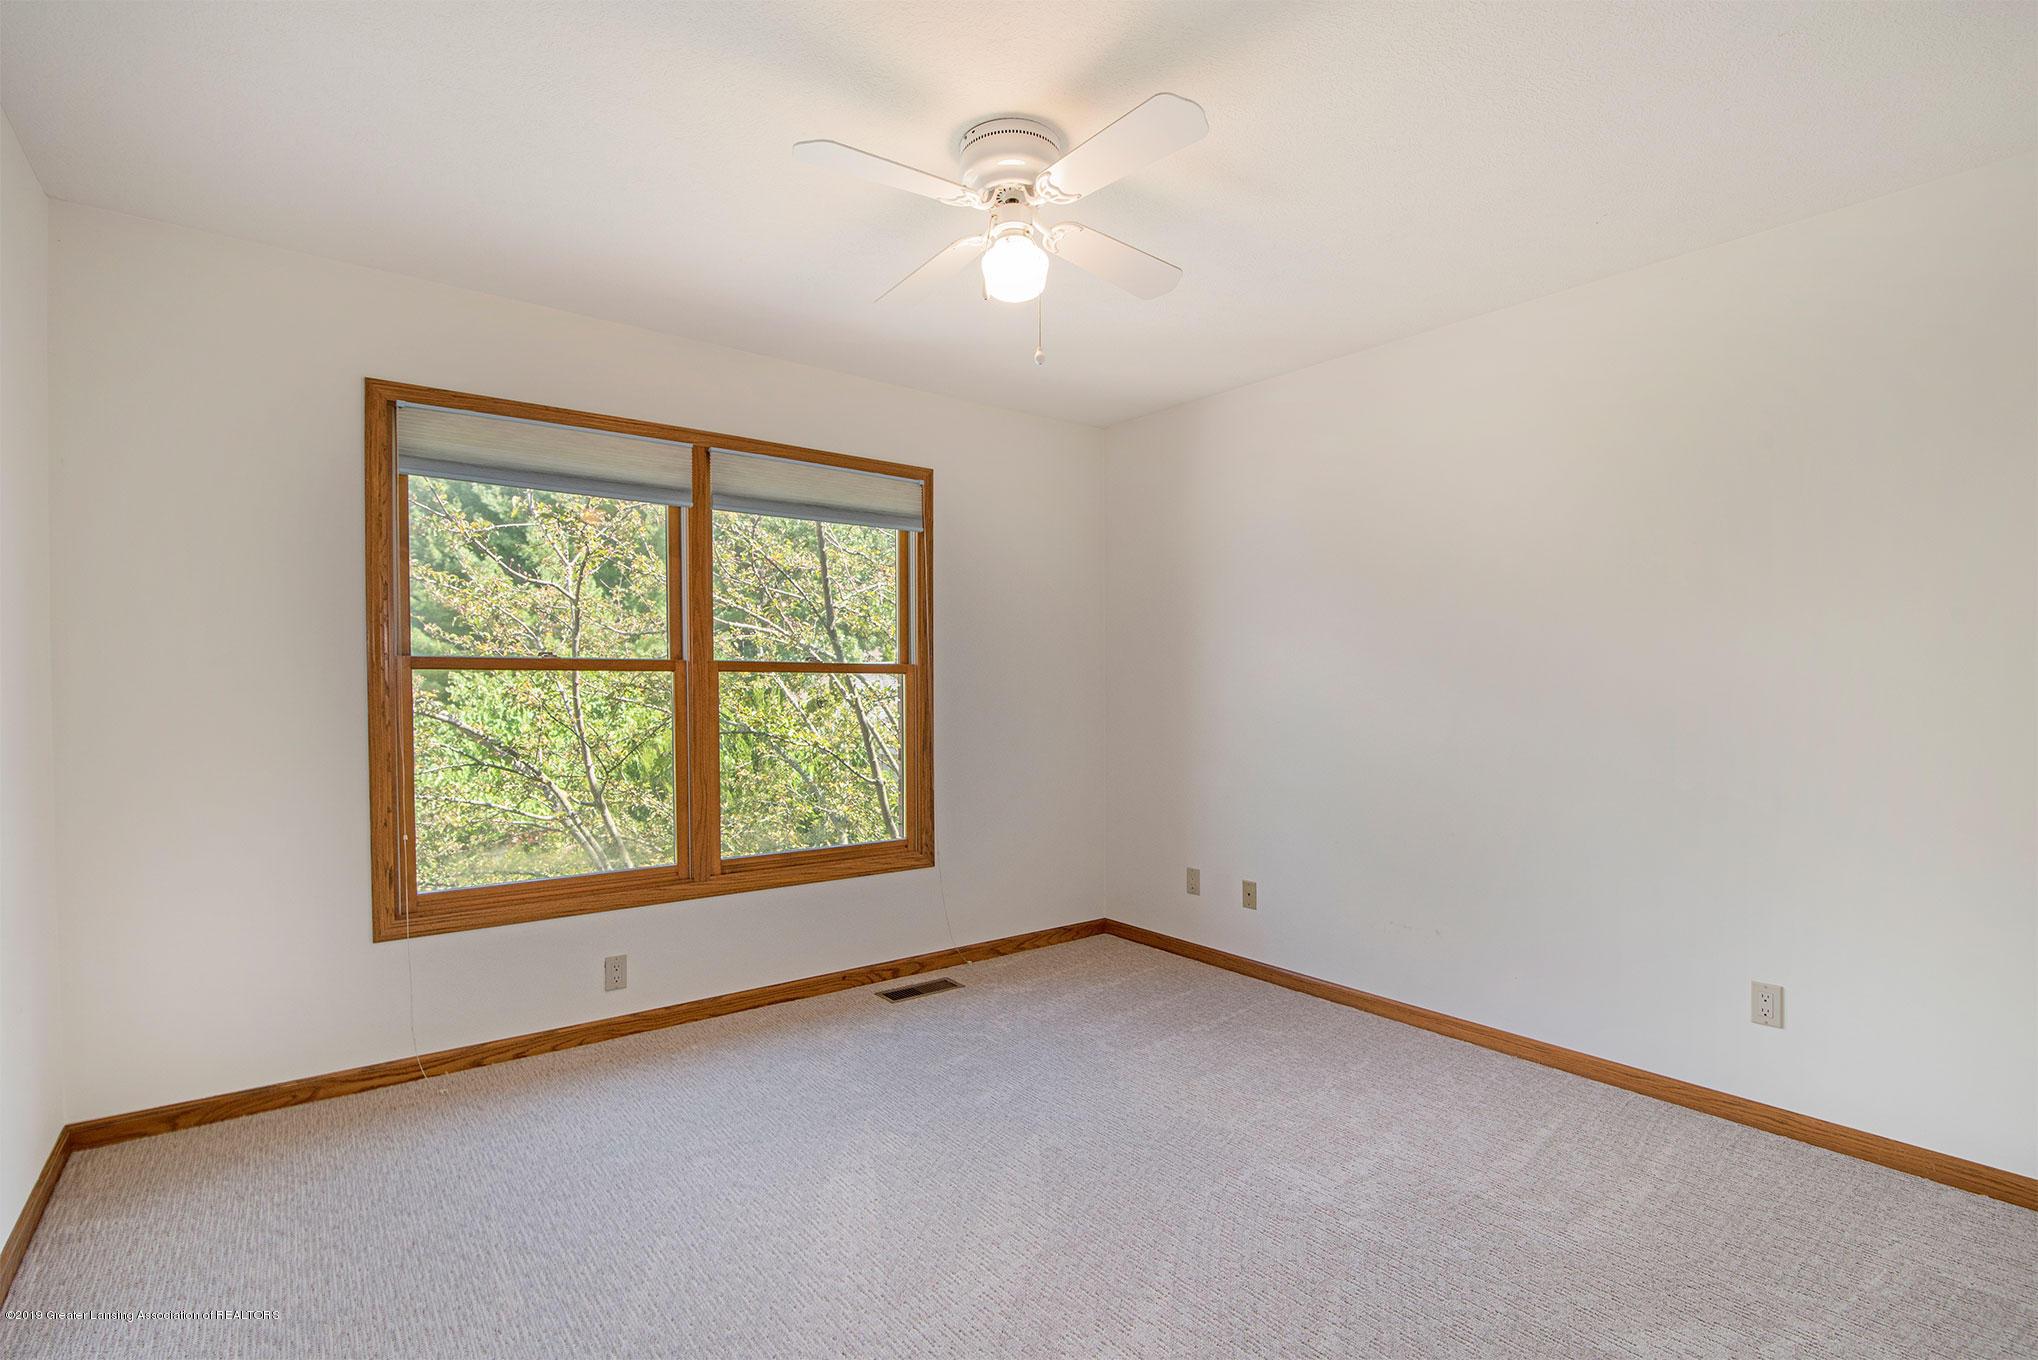 4341 Heartwood Rd - Bedroom - 31